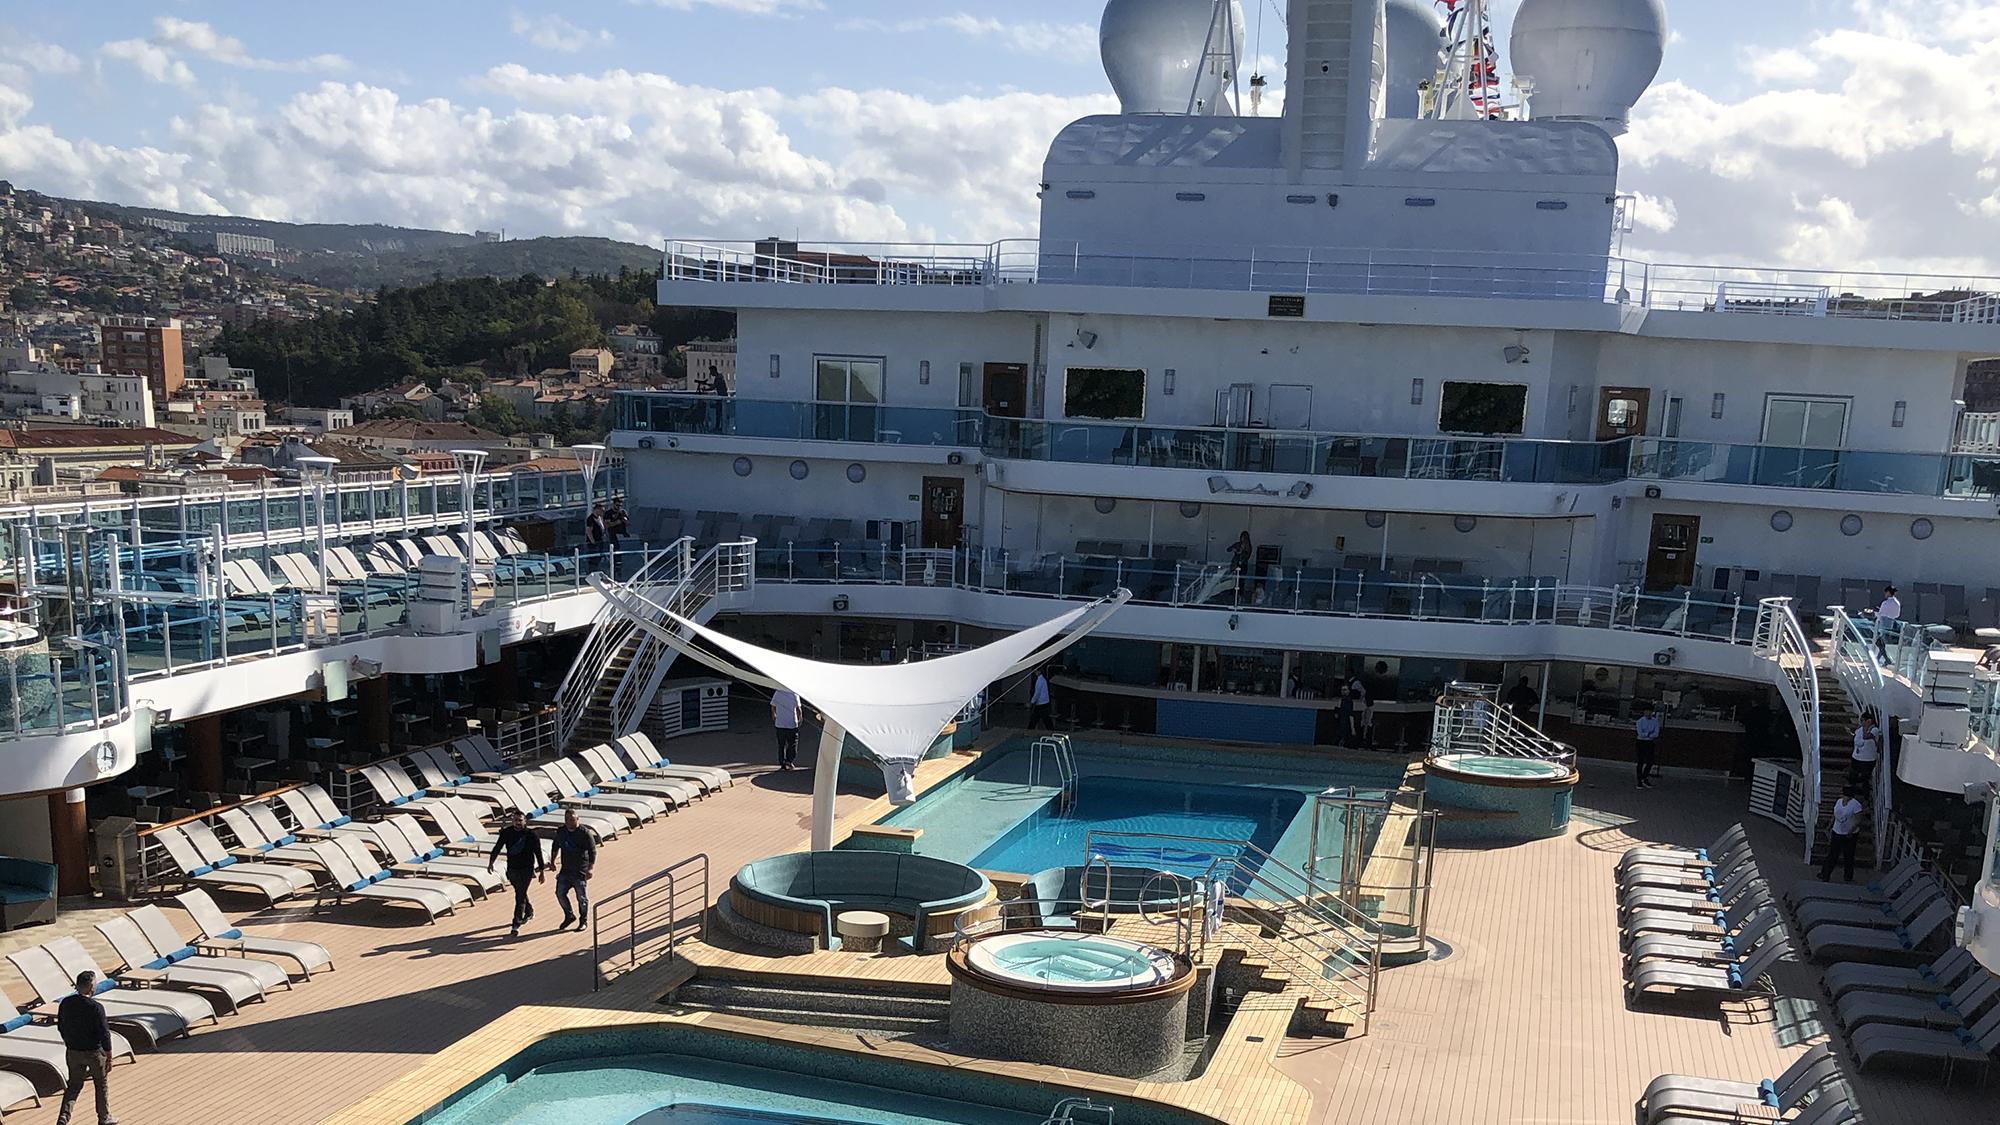 The Sky Princess' pool deck.